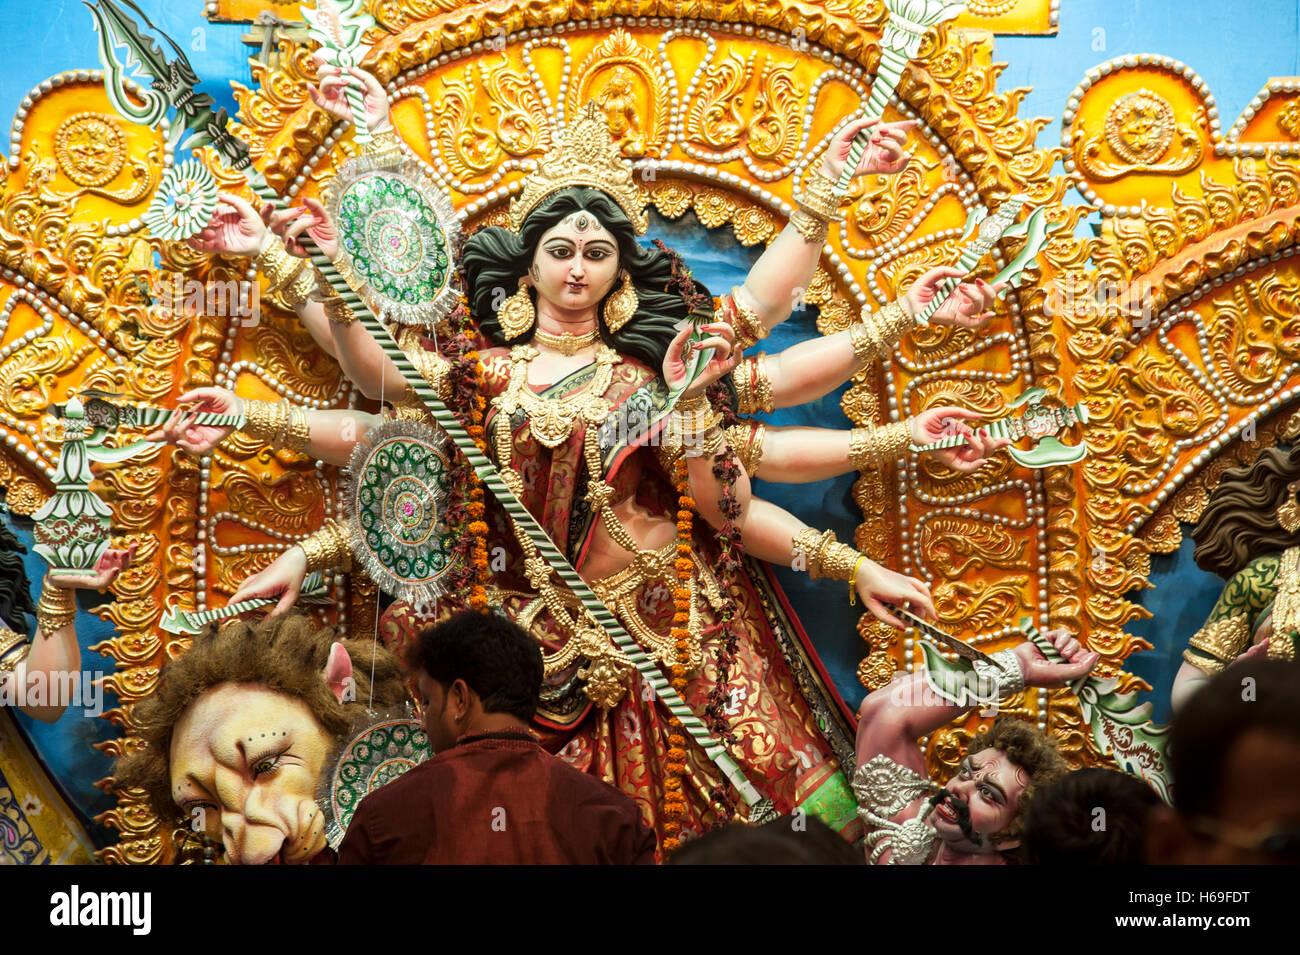 Devotees worshiping the Goddess Durga at nagar bazaar durga puja pandal  kolkata west bengal india - Stock Image